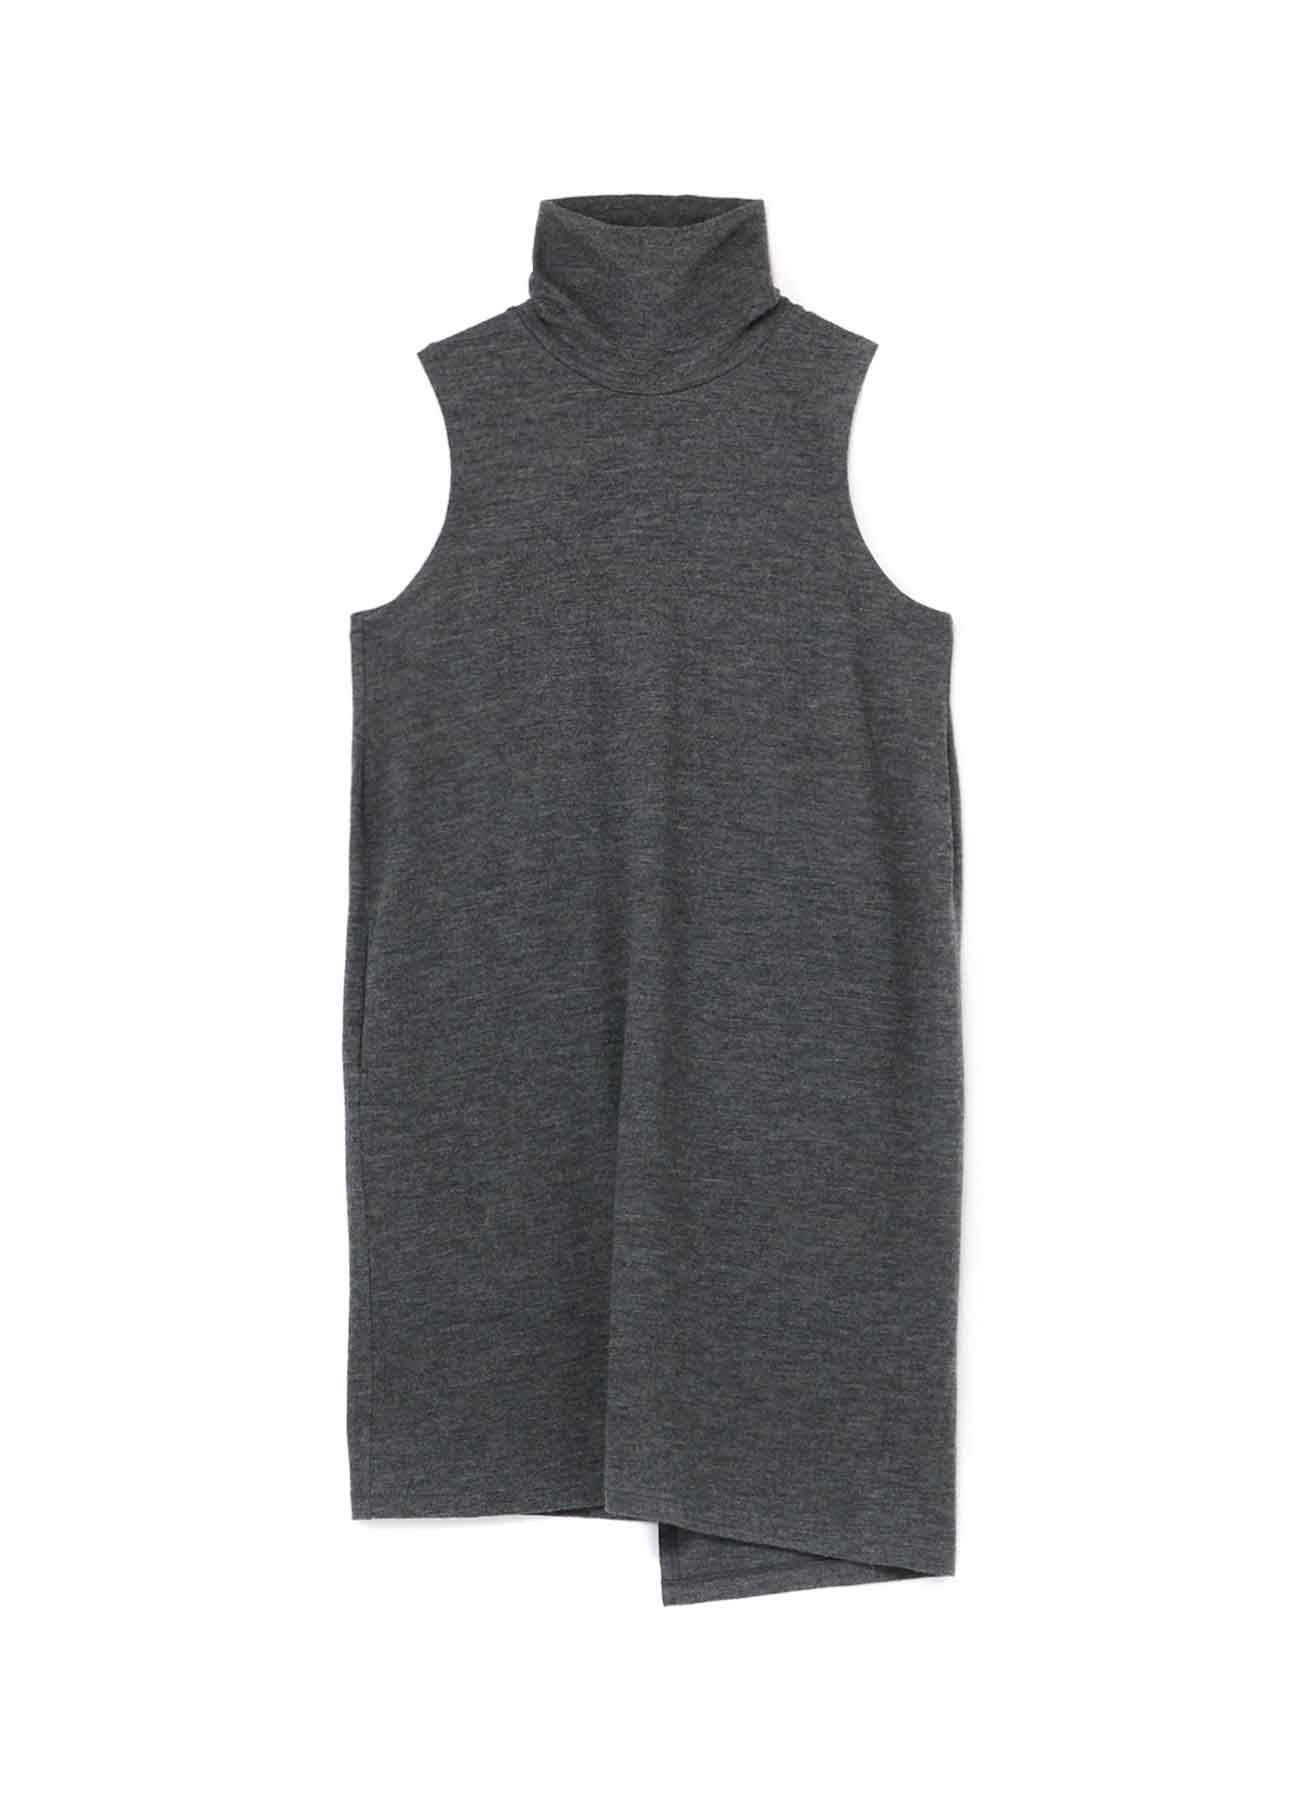 SOFT SHRINKAGE PLAIN STICH HIGH NECK NO SLEEVE DRESS